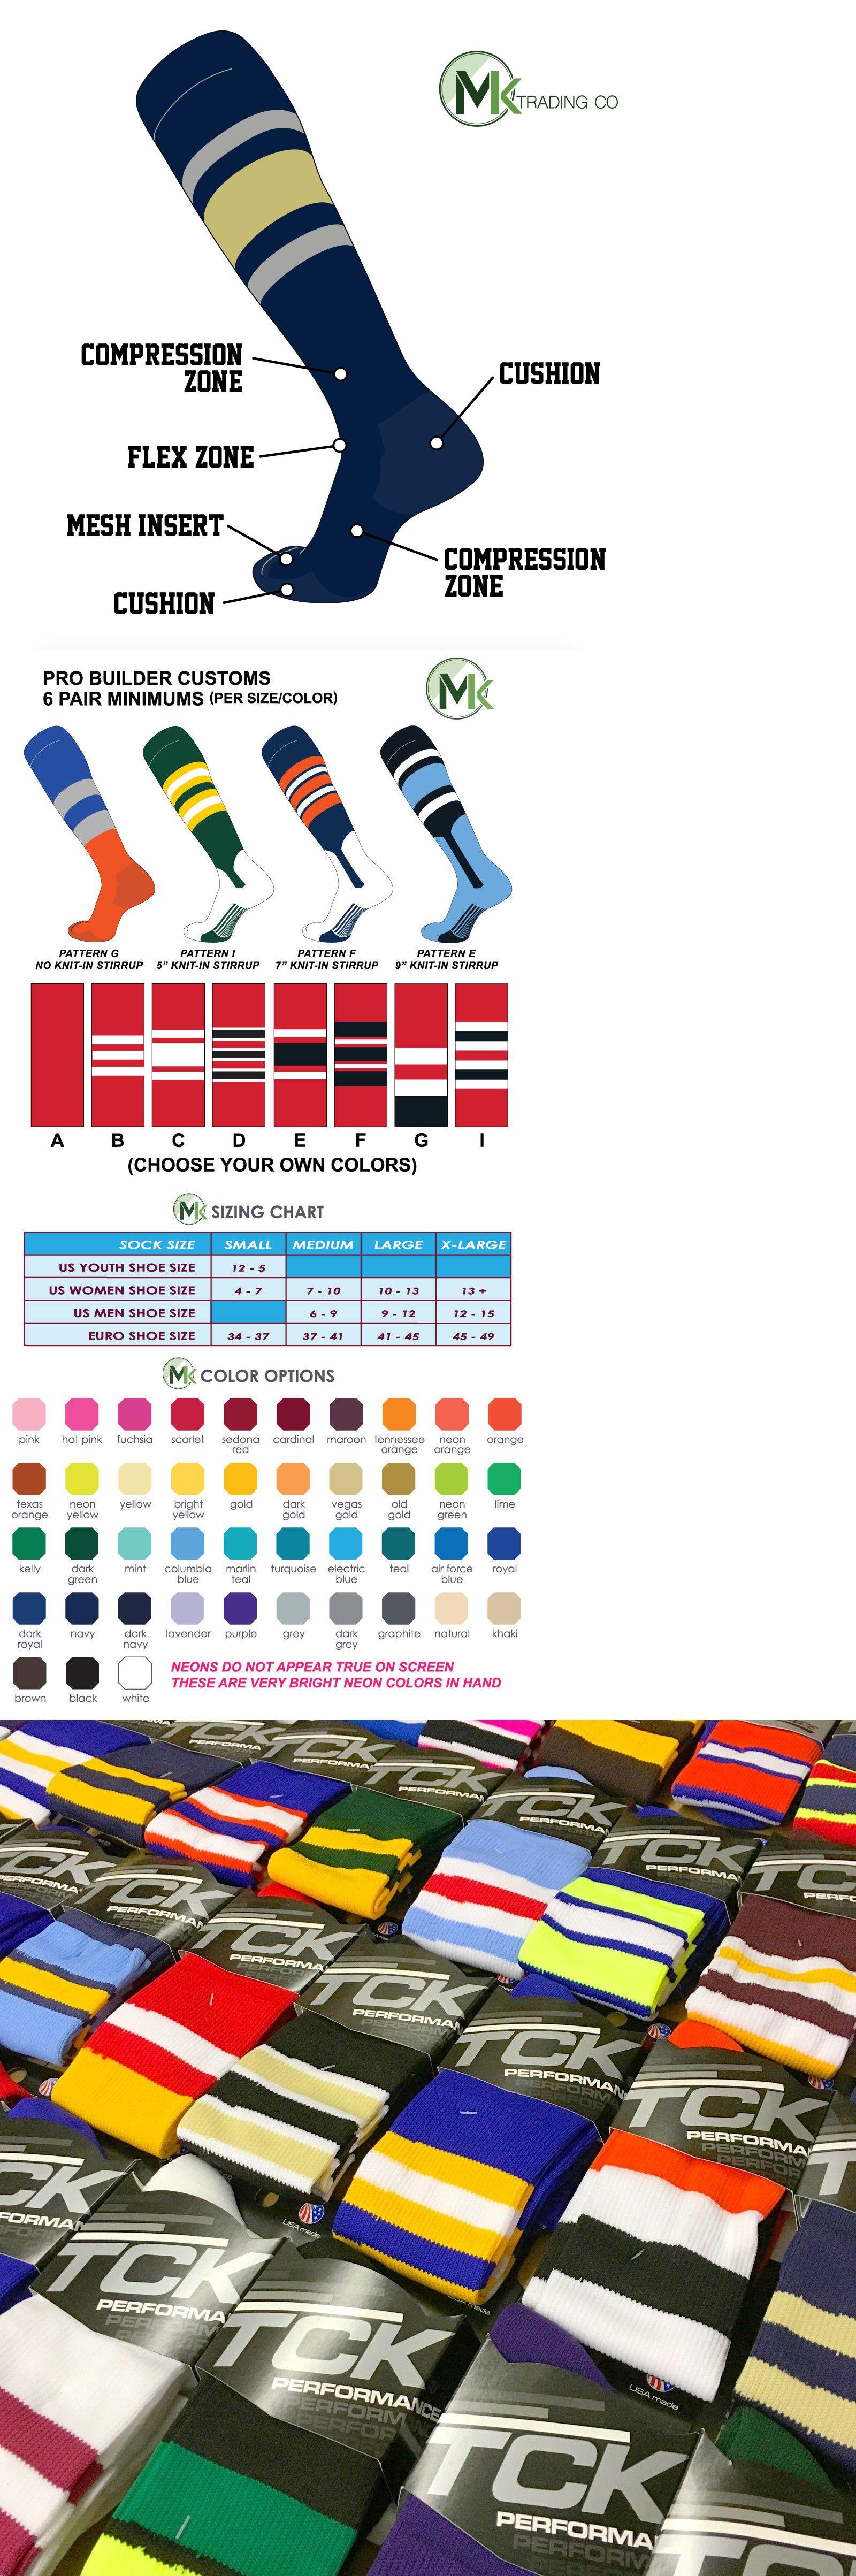 6a3baf5e25d Baseball Socks 181338  Tck Elite Baseball Football Knee High Striped Socks  (E) Navy